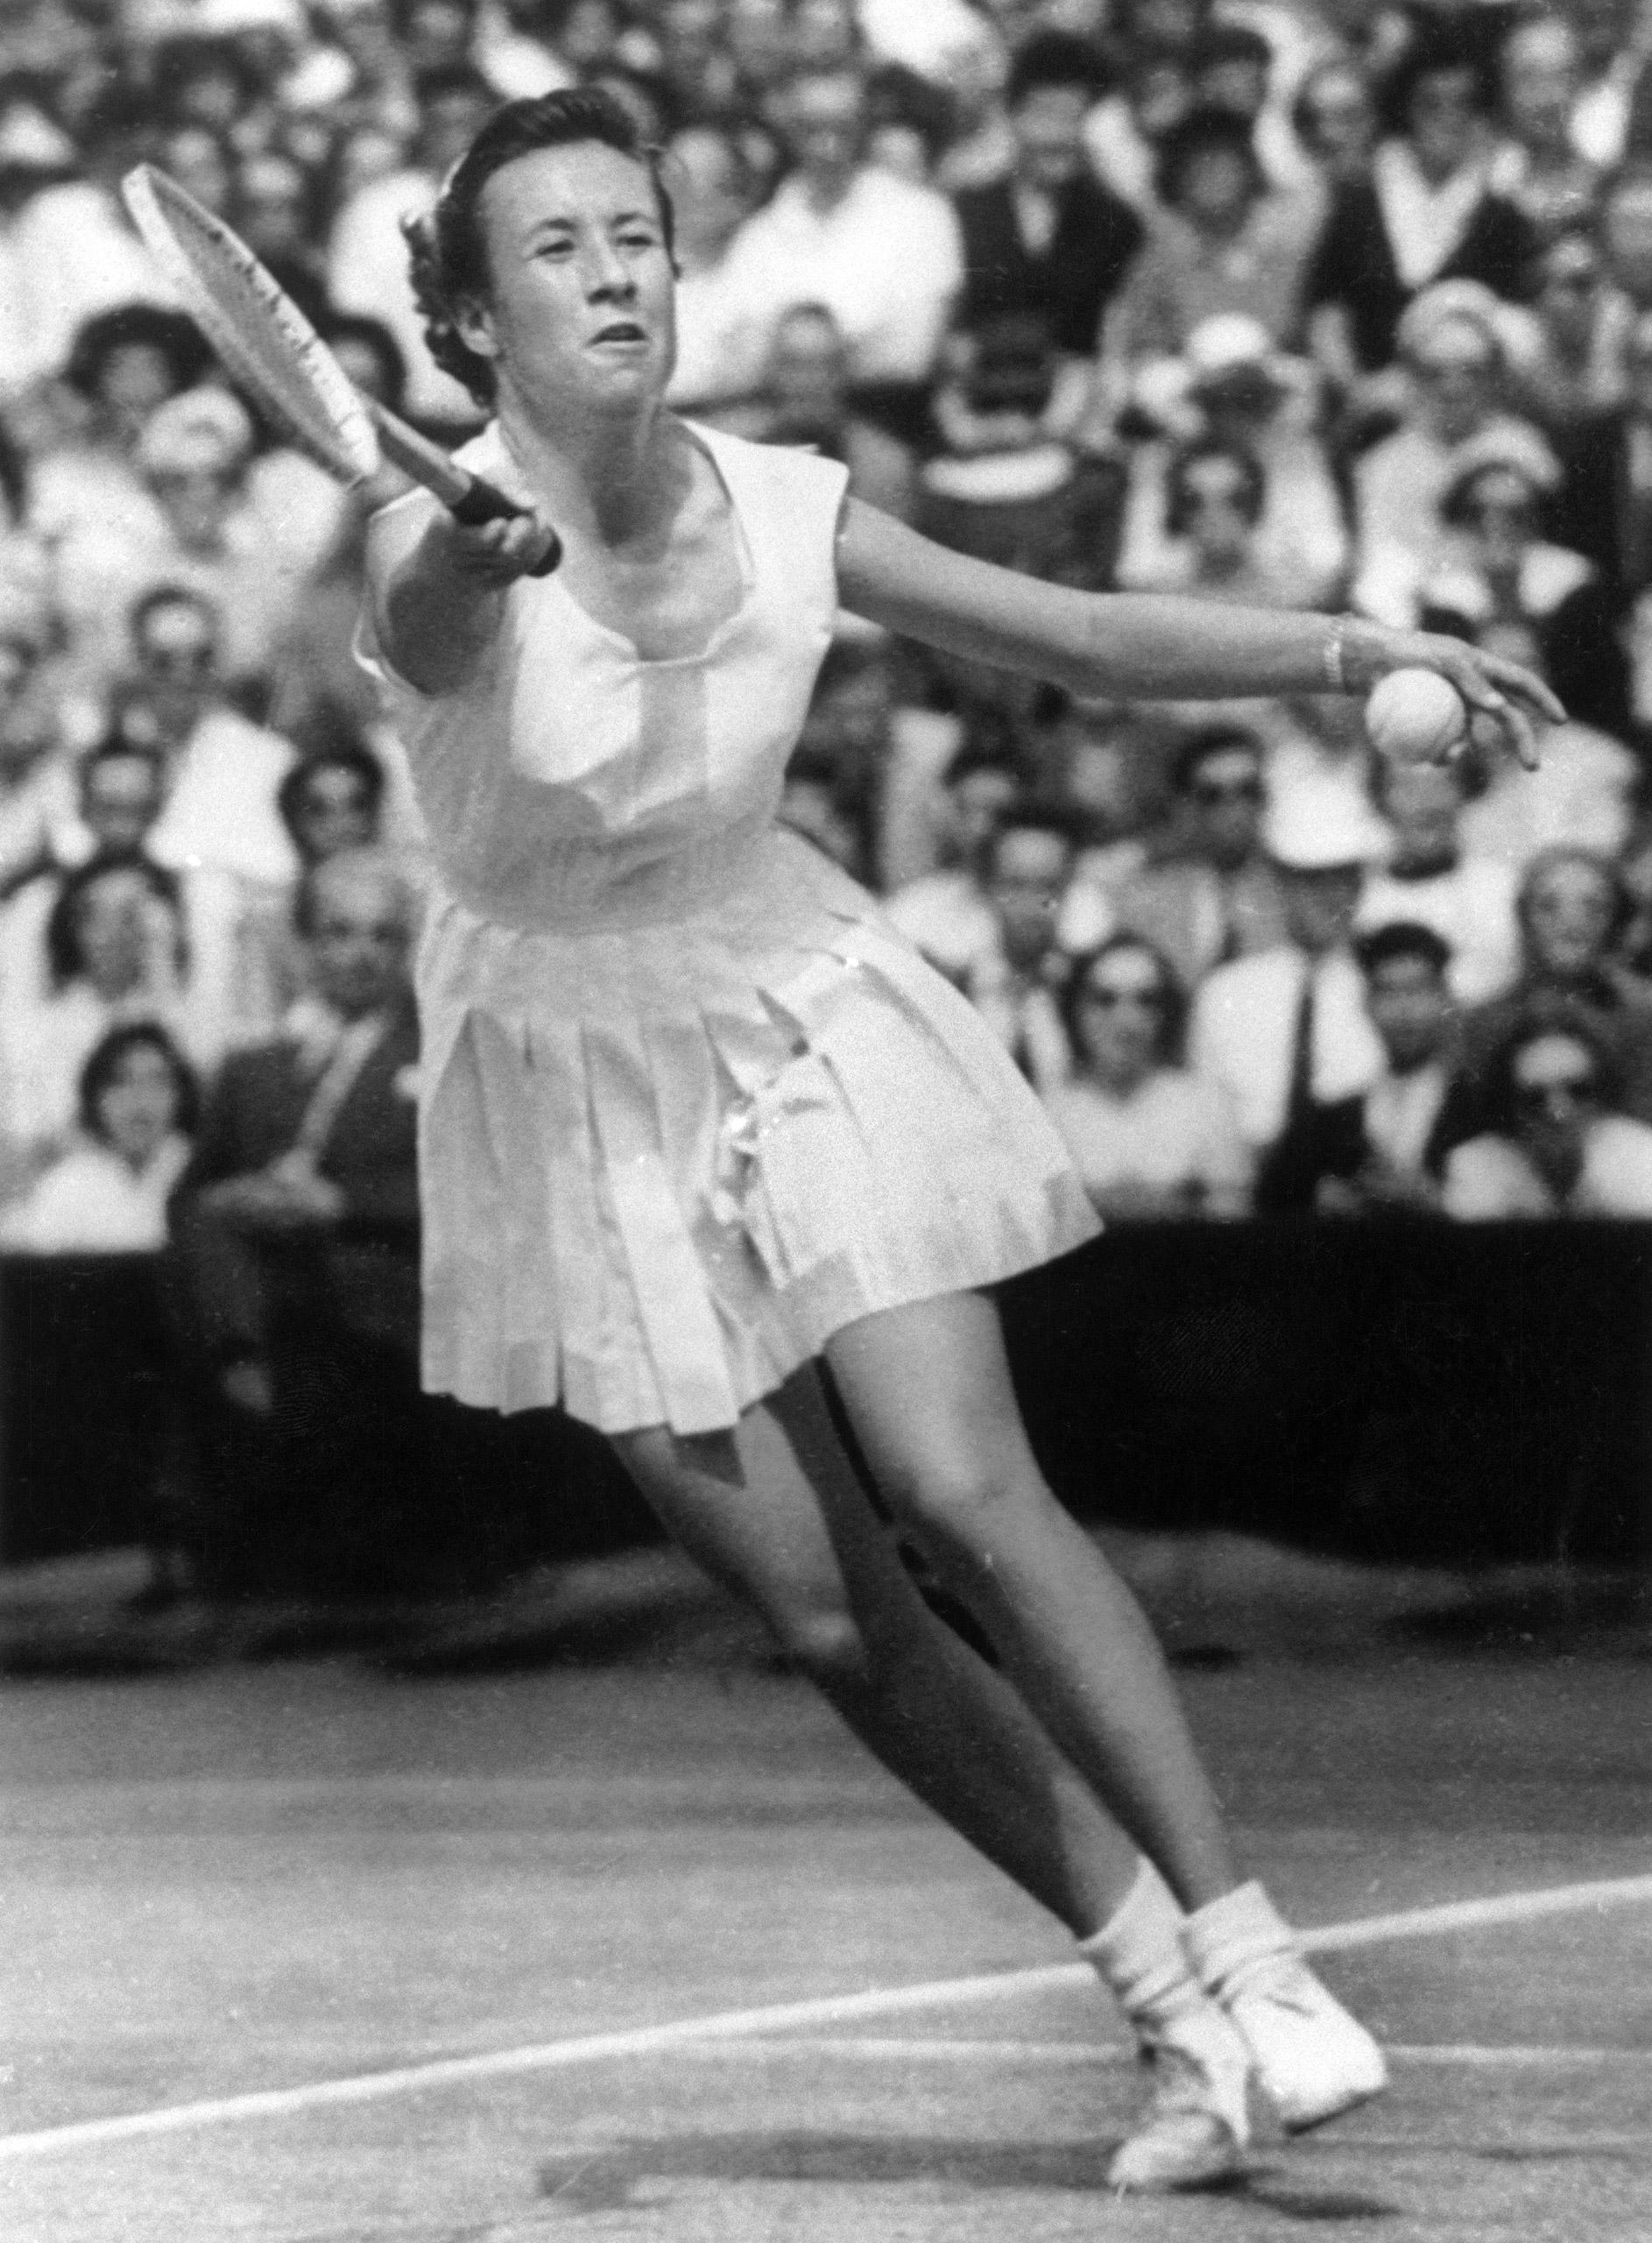 Maureen Connolly at Wimbeldon, July 4, 1953.